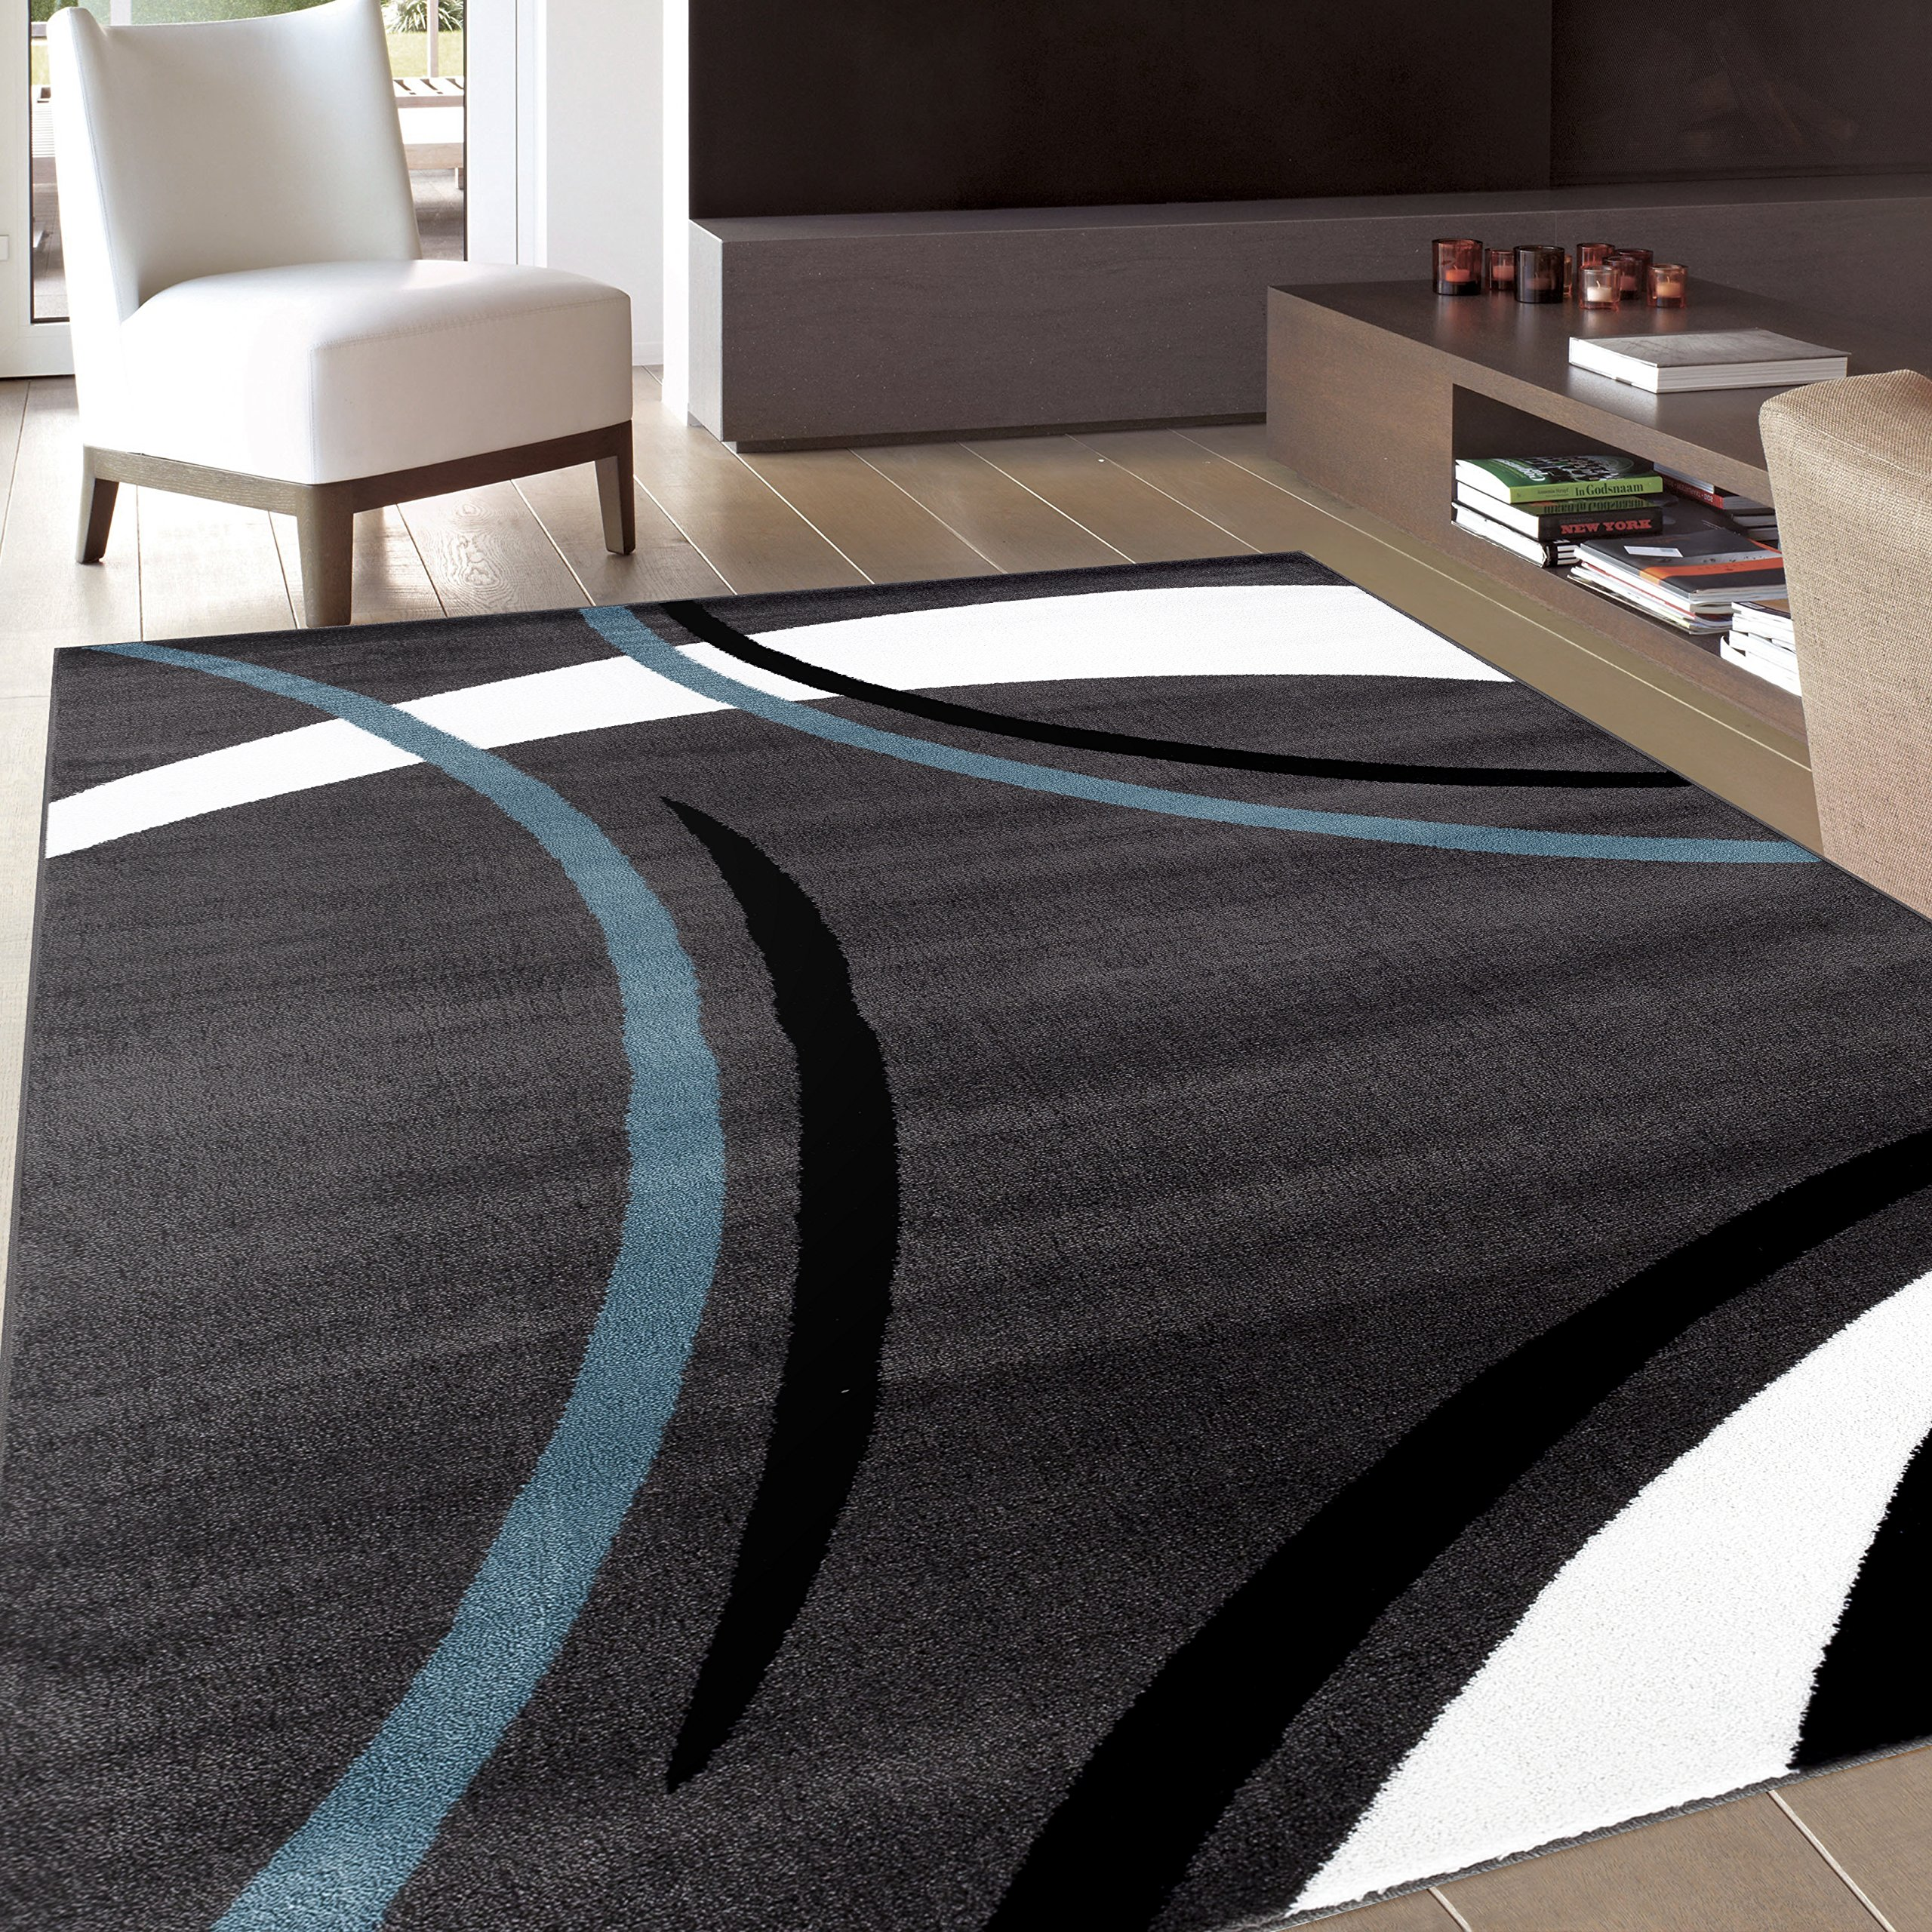 Rug Decor Contemporary Modern Wavy Circles Area Rug, 7' 10'' by 10'2'', Grey